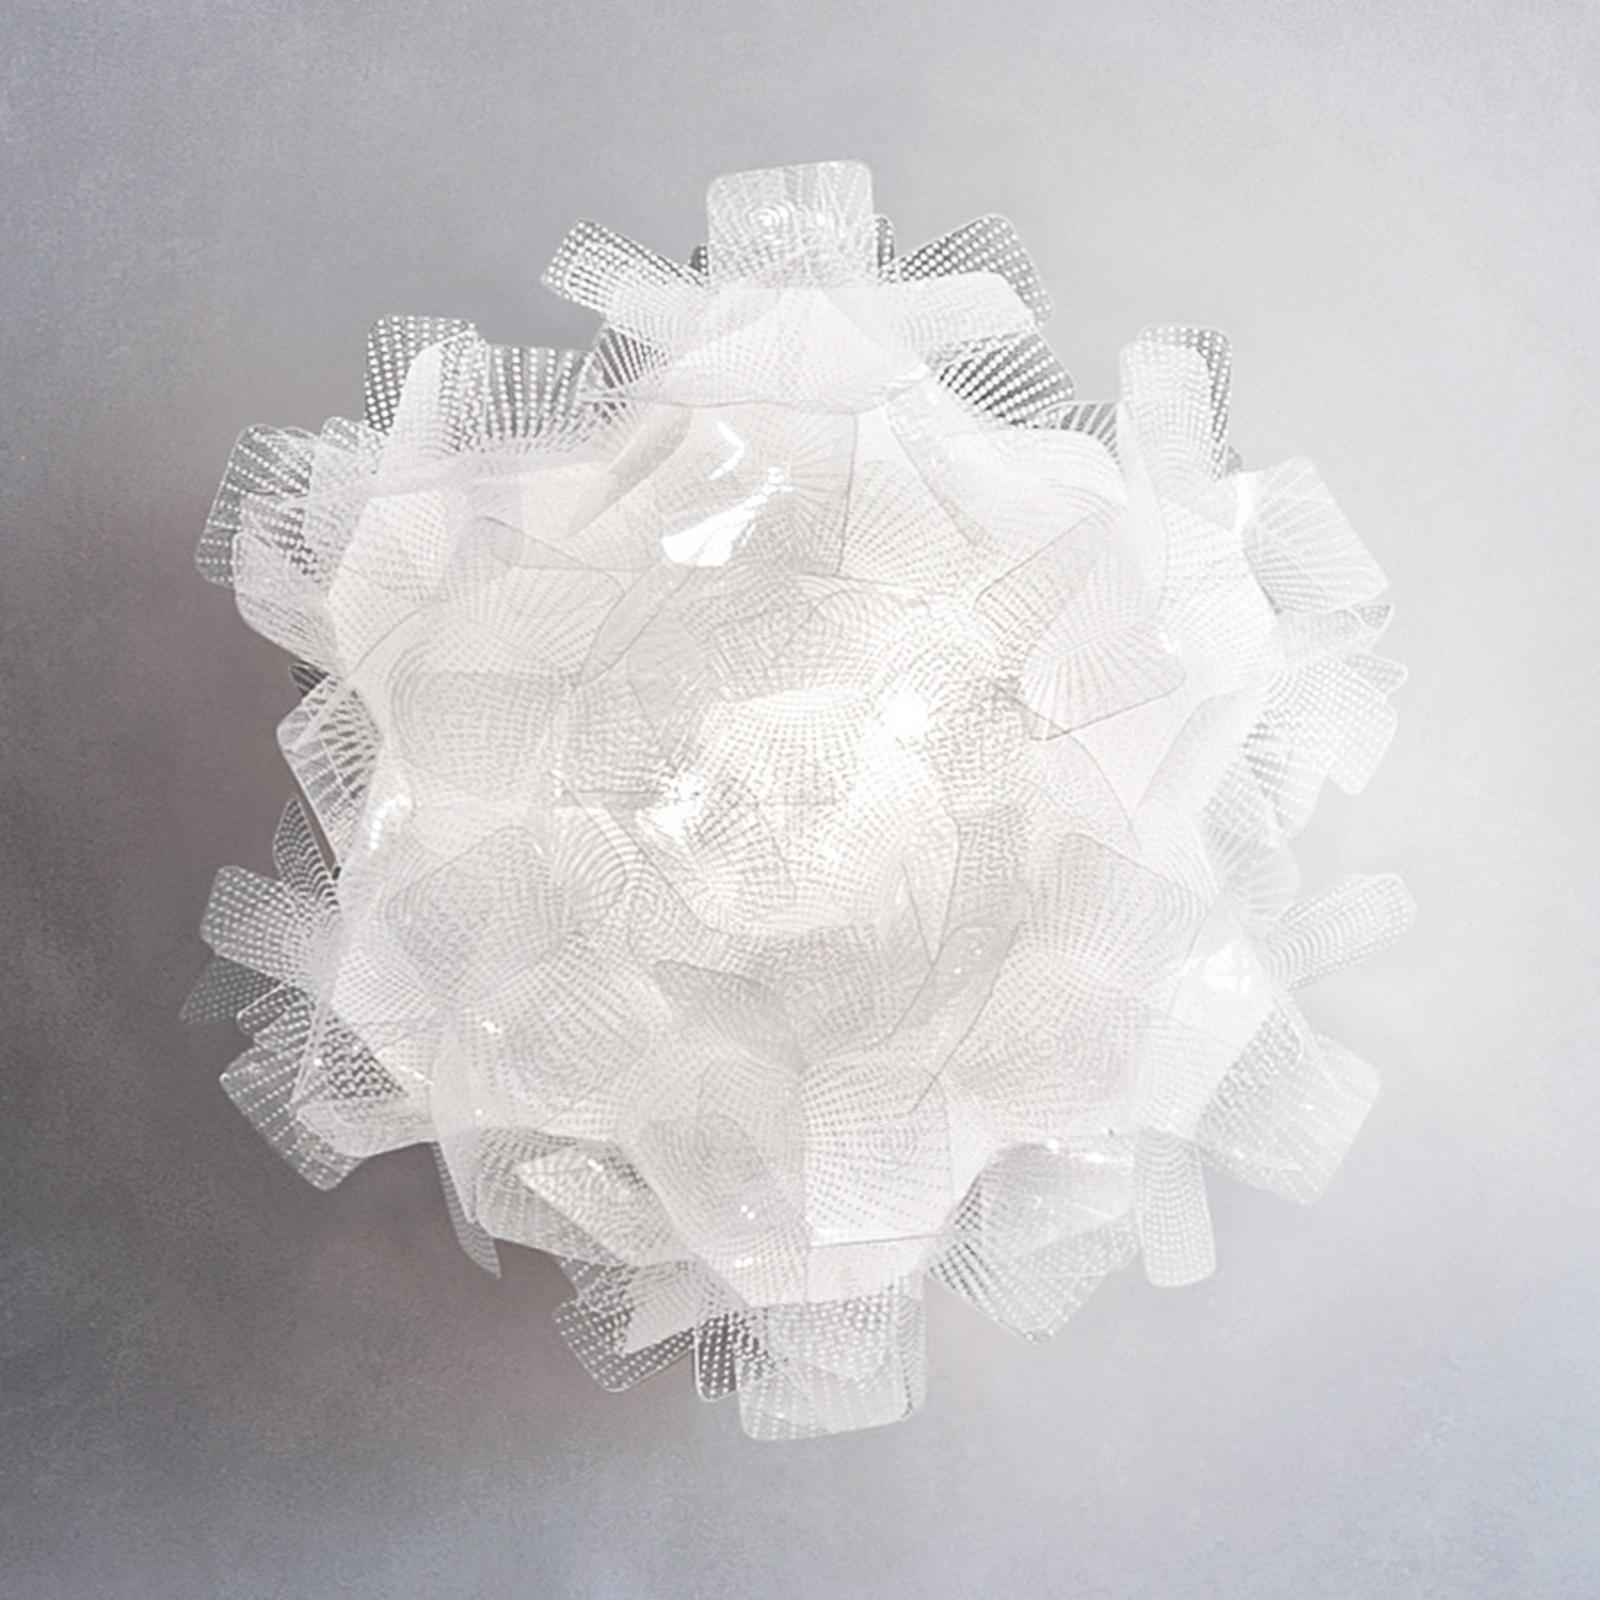 Slamp Clizia Pixel væglampe, Ø 32 cm